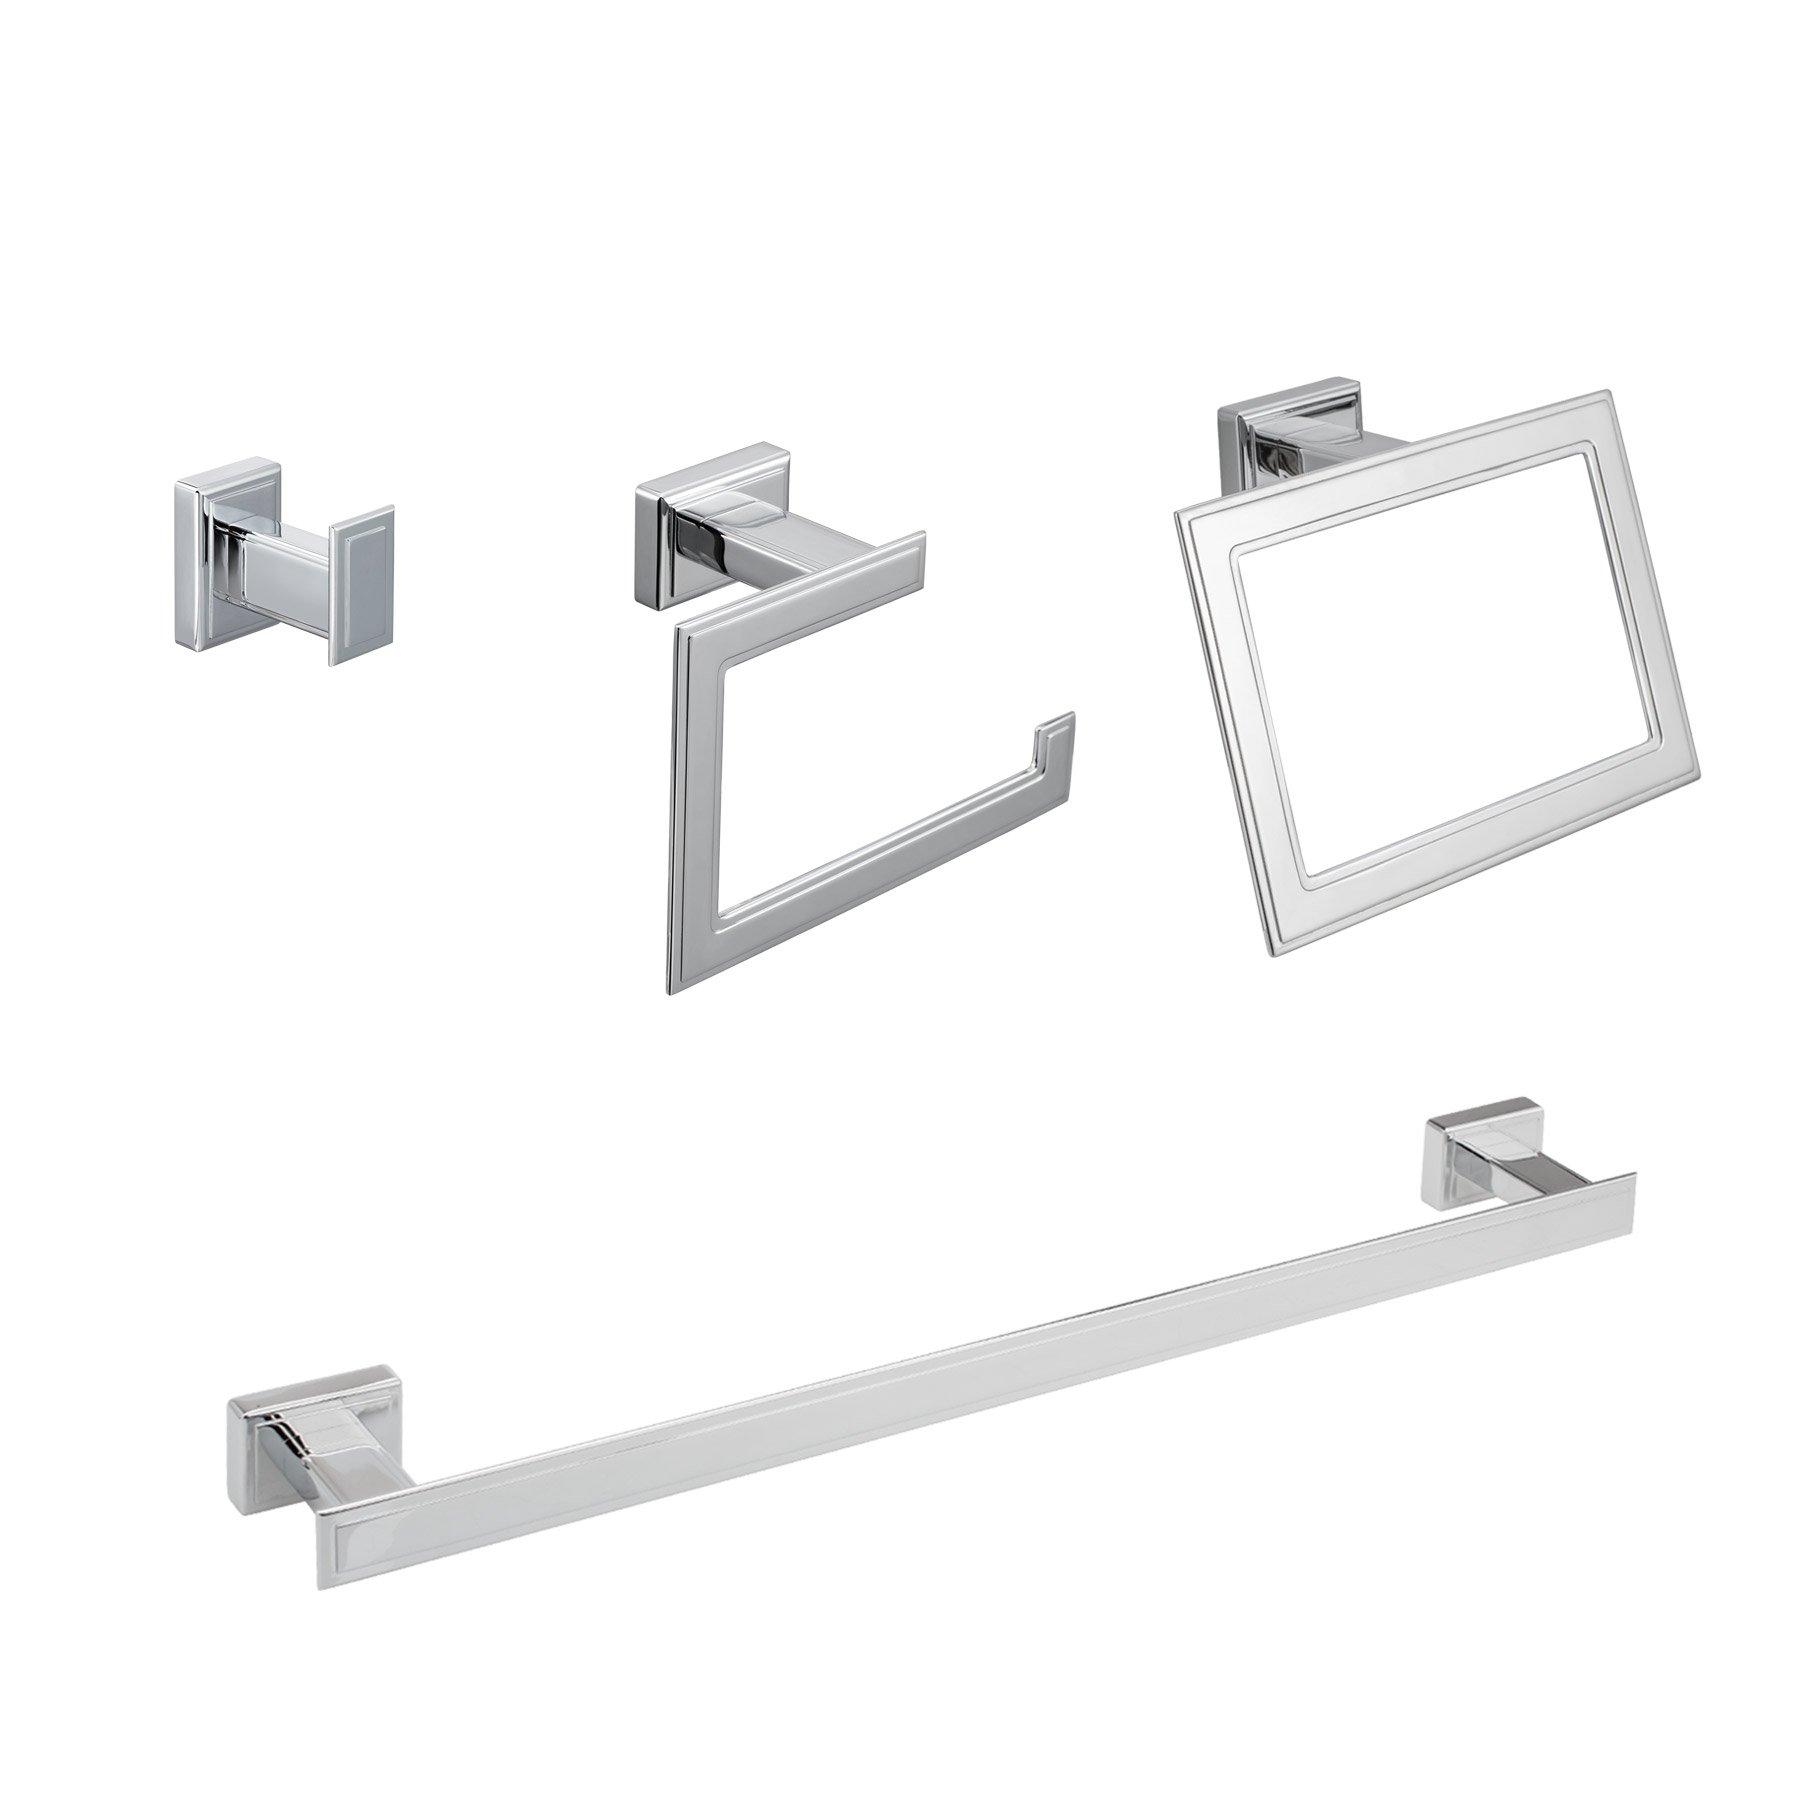 "MAYKKE Carraway 4-Piece Bathroom Essentials Hardware Accessory Set 18"" Towel Bar, Robe Towel Hook, Towel Ring, Toilet Paper Holder For Bath, Shower, Kitchen Polished Chrome, OYA1051491"